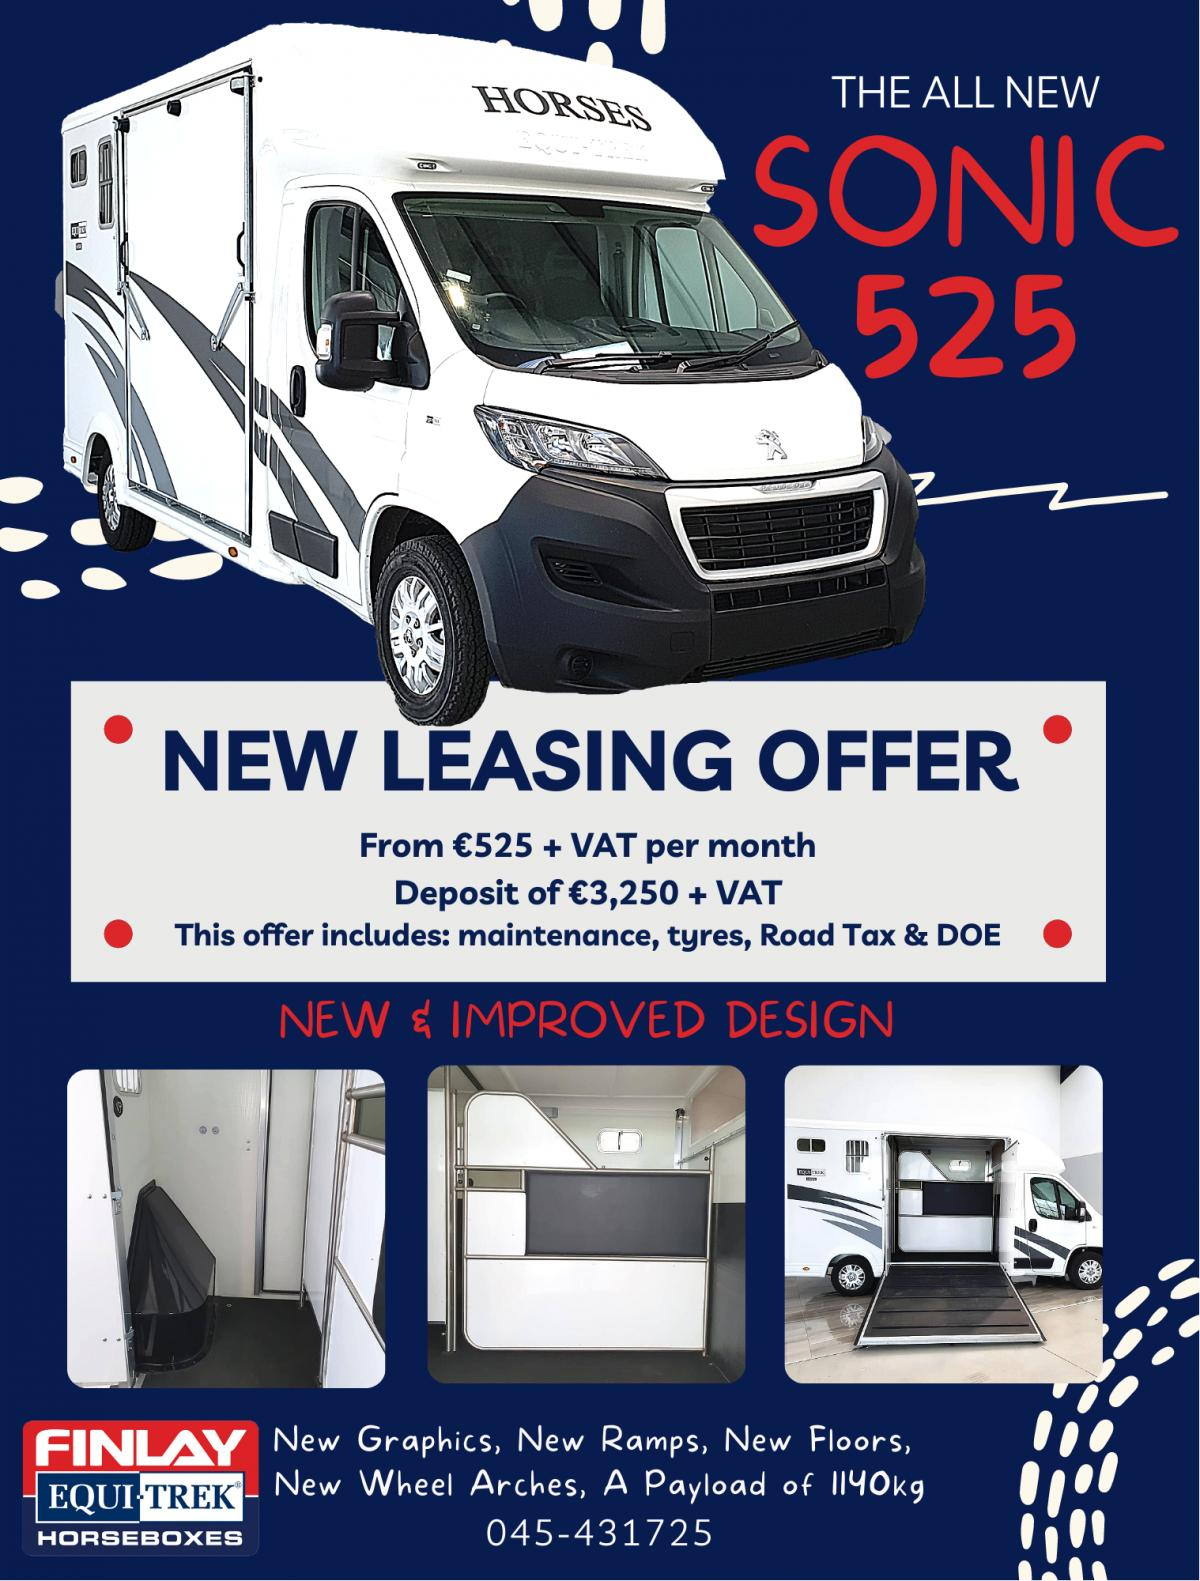 SONIC 525 Leasing Offer